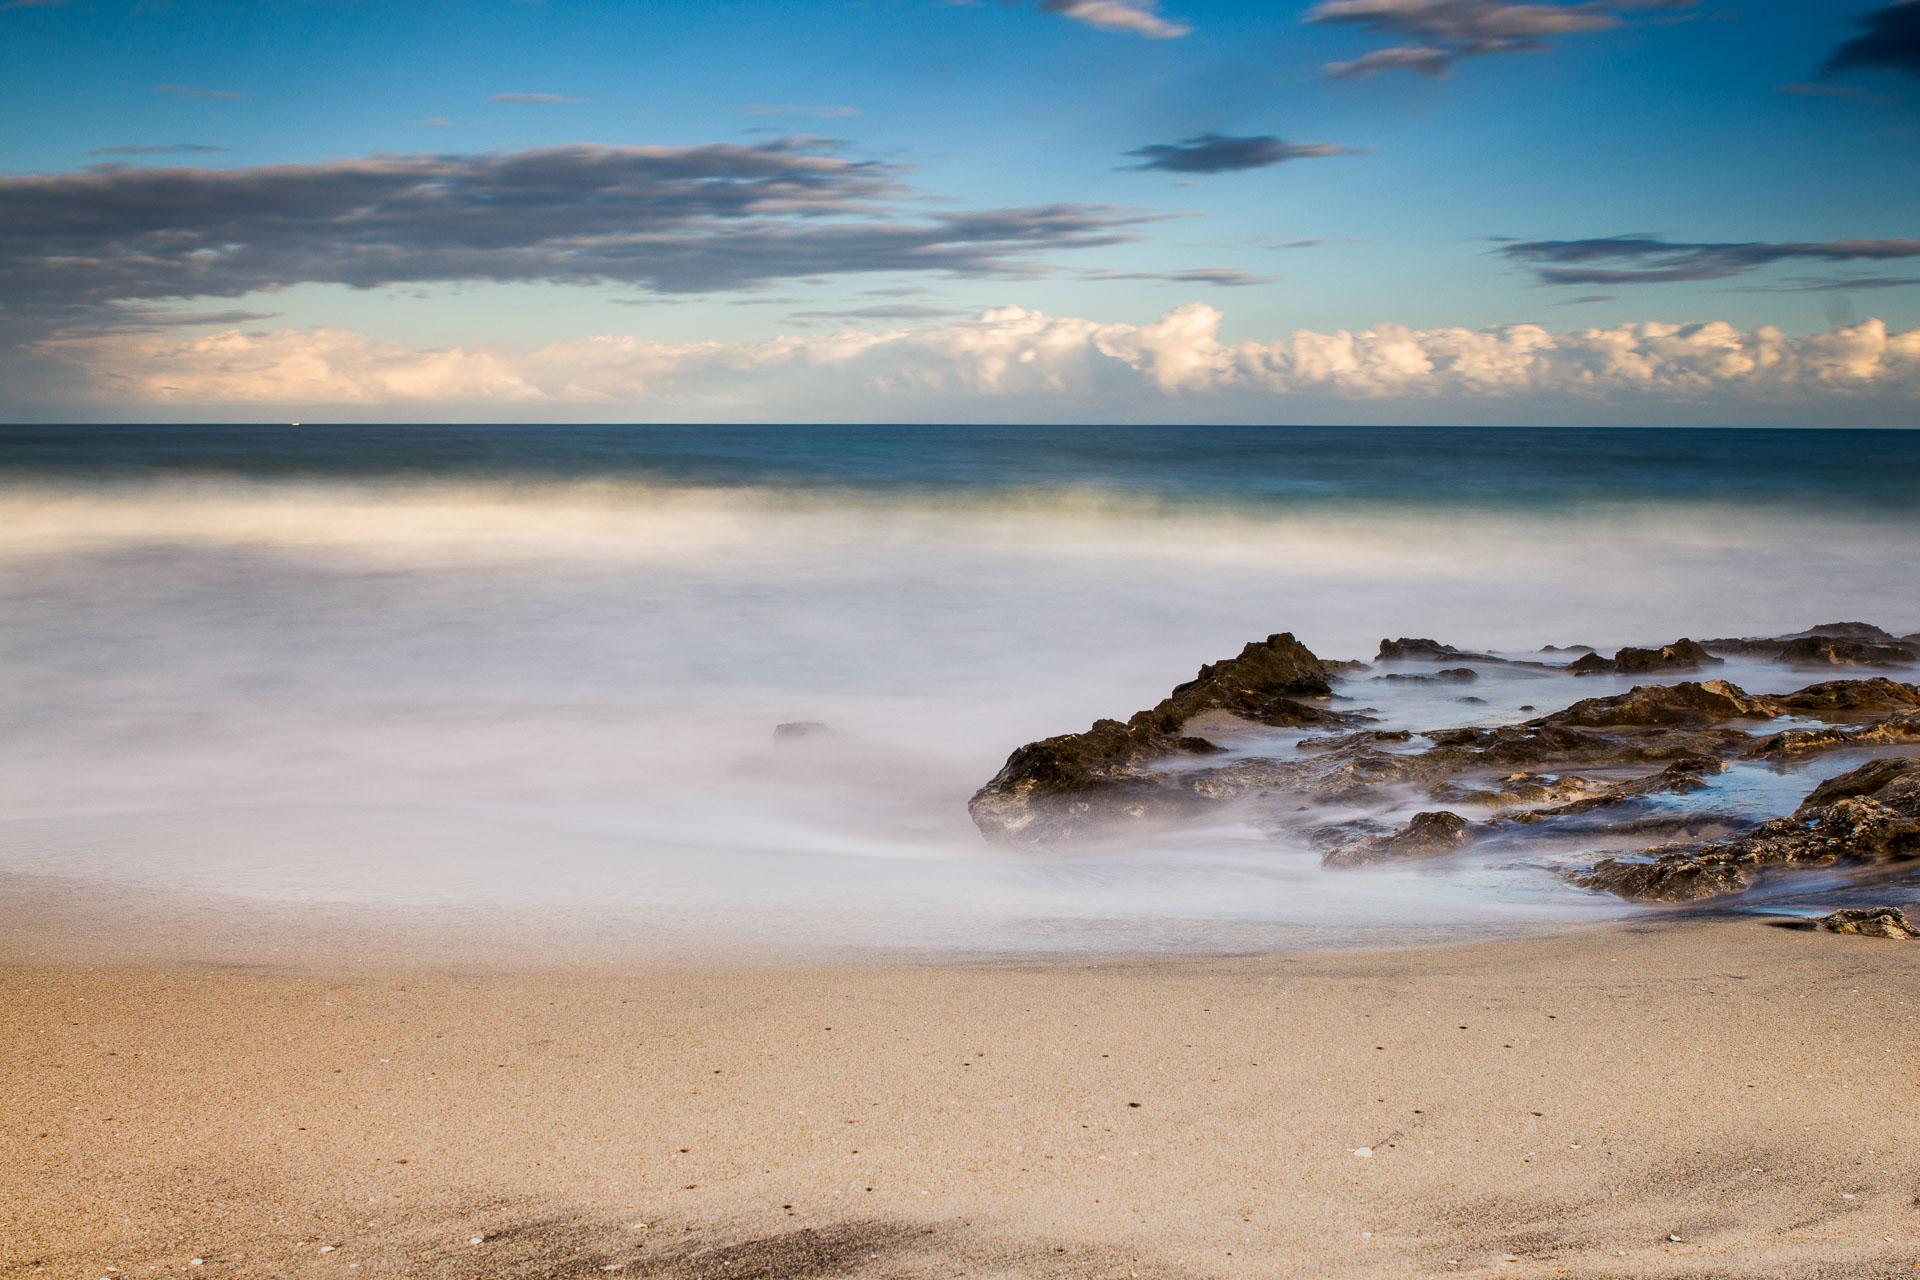 Una spiaggia al tramonto, seascape long exposure photography